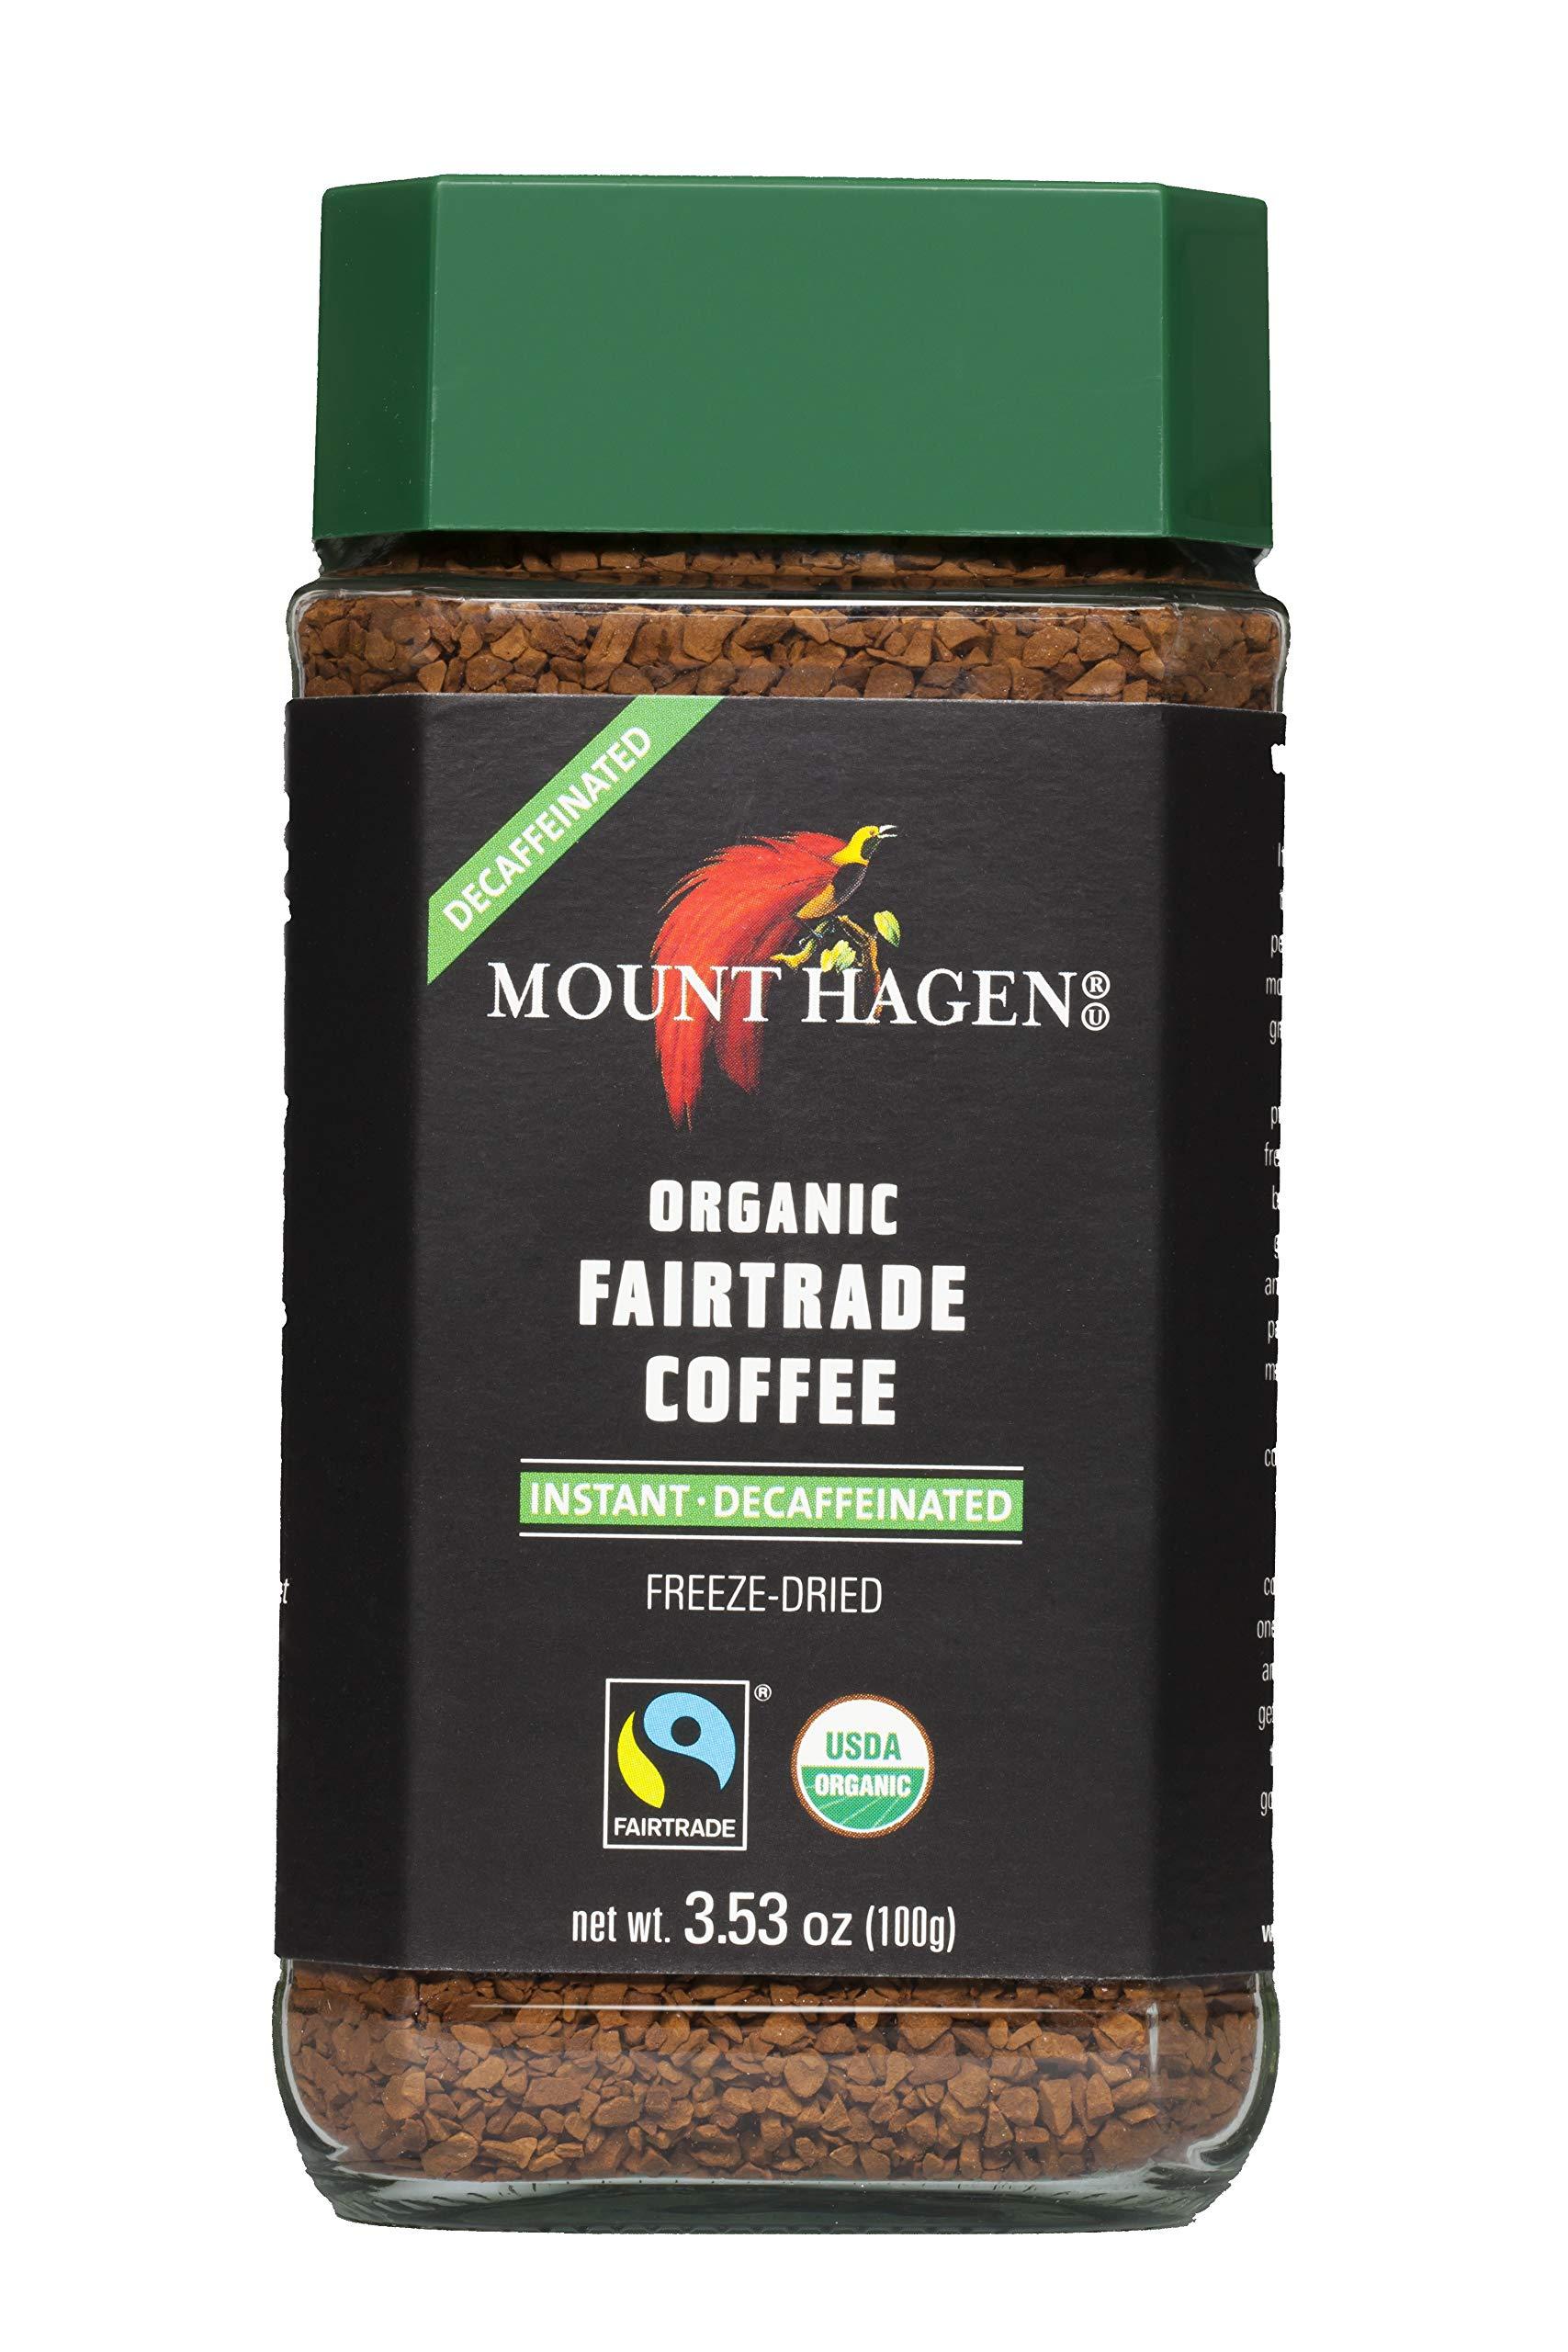 Mount Hagen Organic Freeze Dried Instant Decaf Coffee, 3.53 oz Organic FairTrade Award-Winning House Blend Kosher Decaffeinated